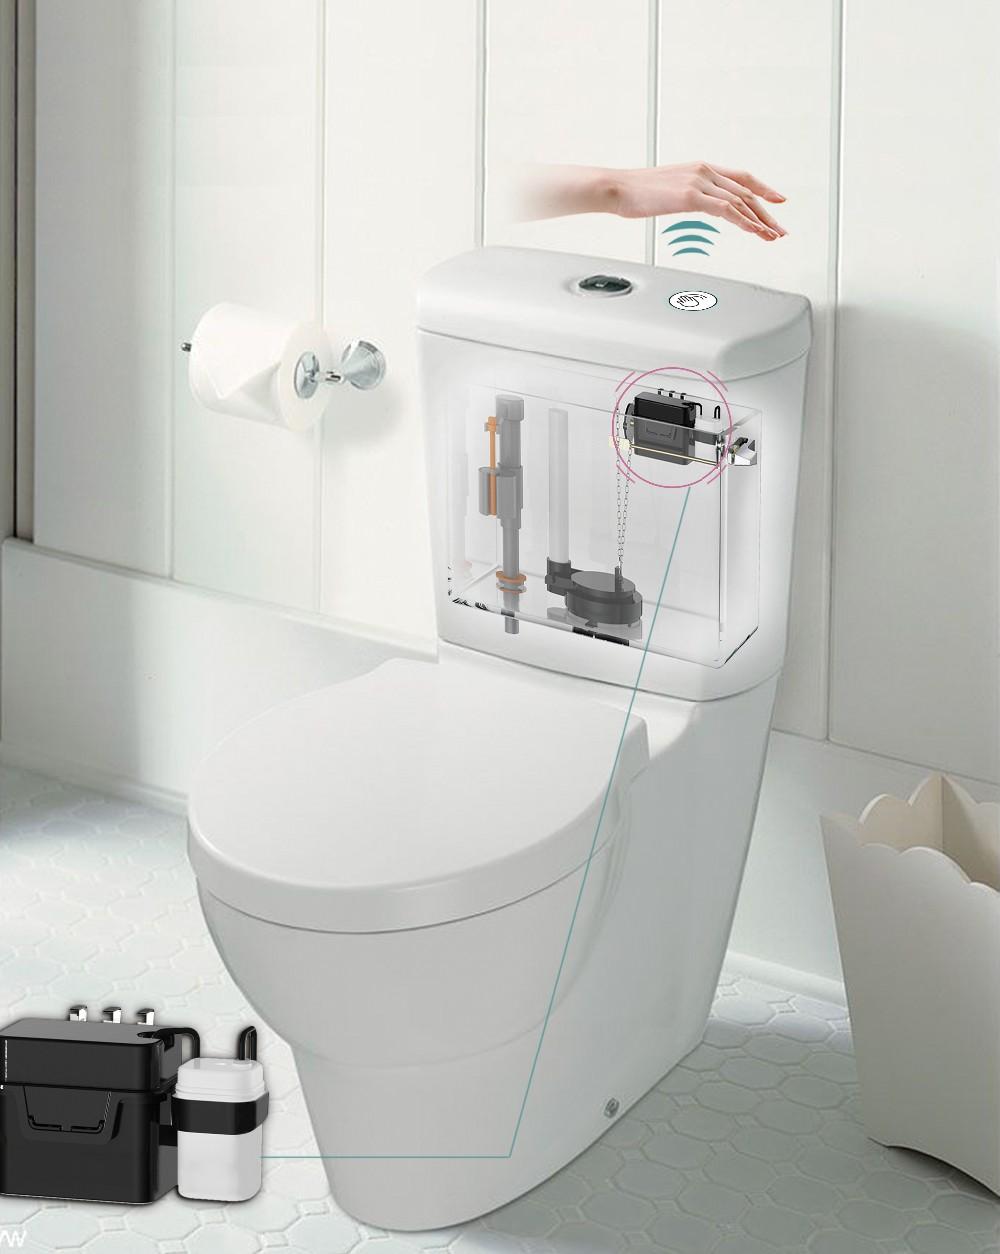 Modern Lavatory Appliance Wave Sensor Toilet Tank Flush